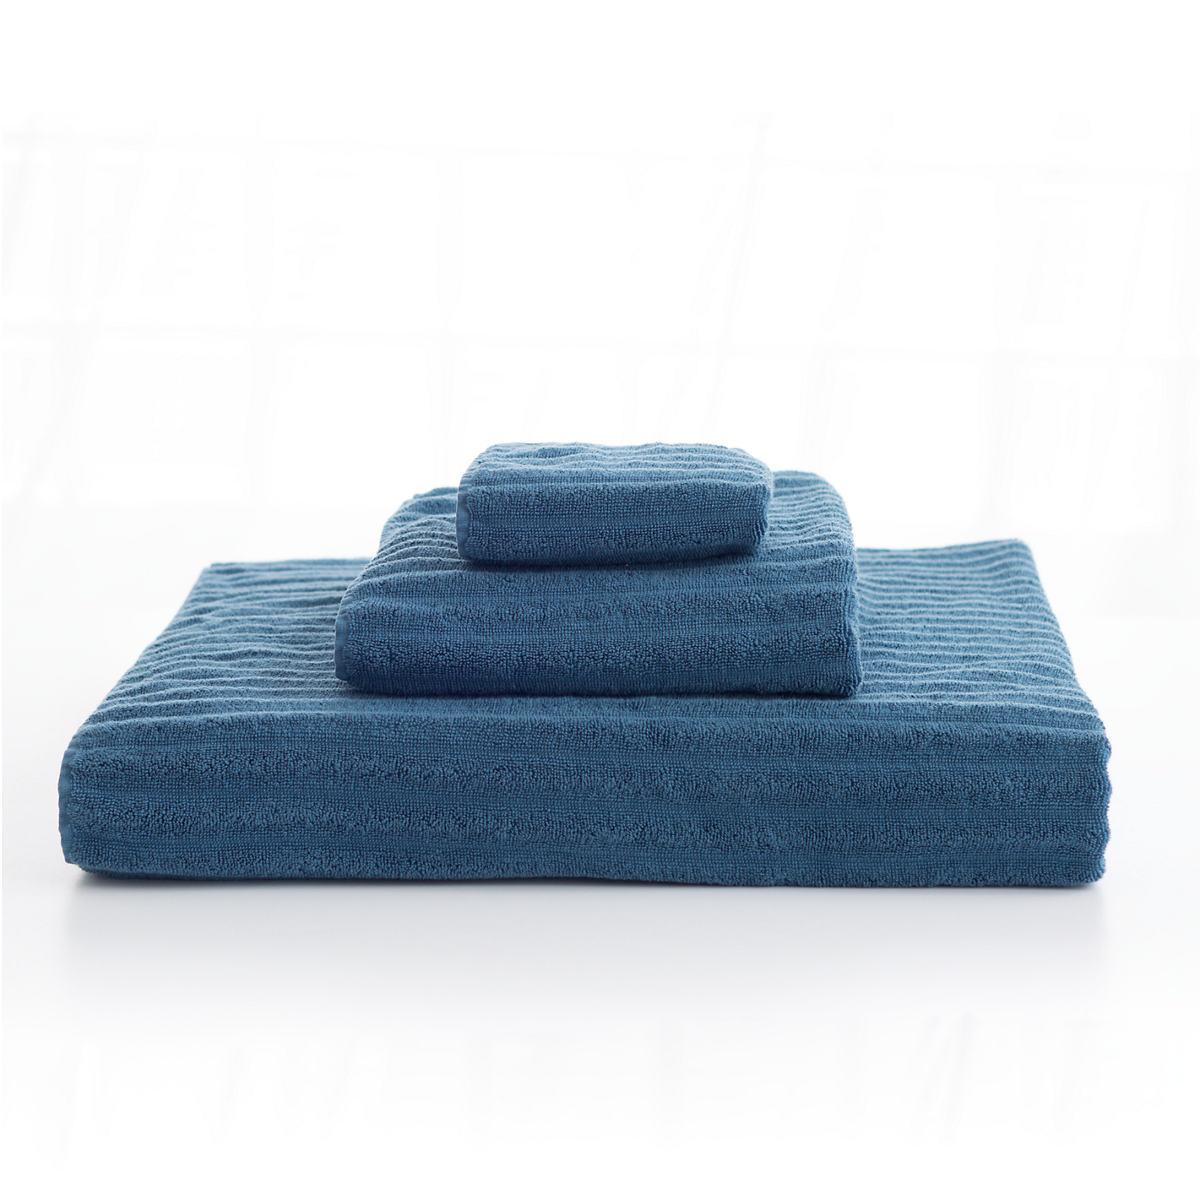 Boyfriend Aegean Towel